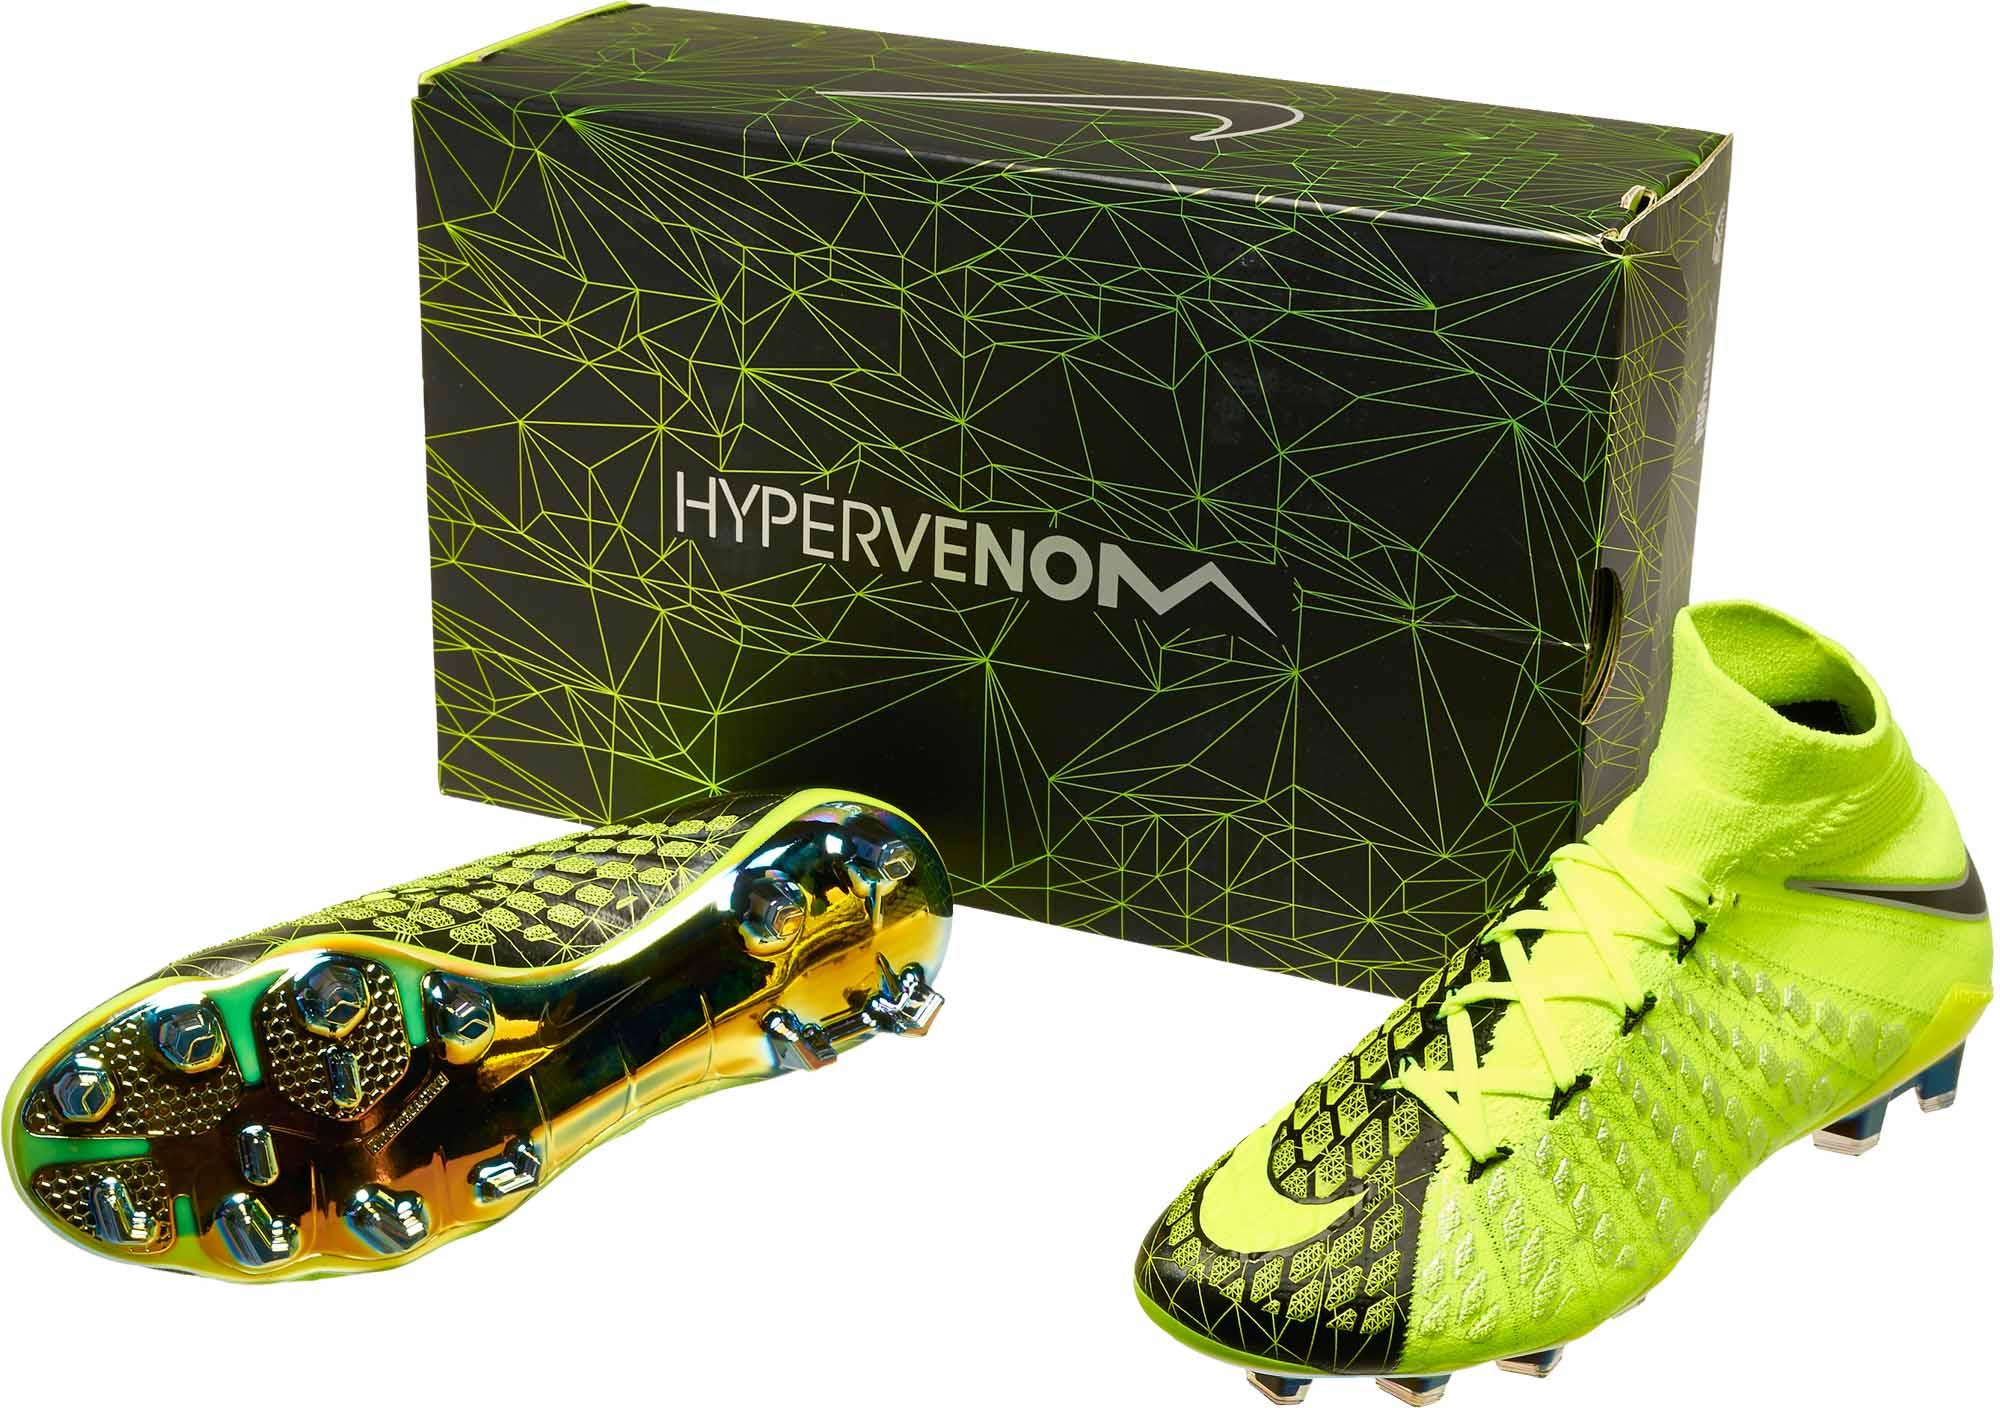 uk availability 3a74f 8c097 Nike Hypervenom Phantom III DF FG - EA Sports - Volt